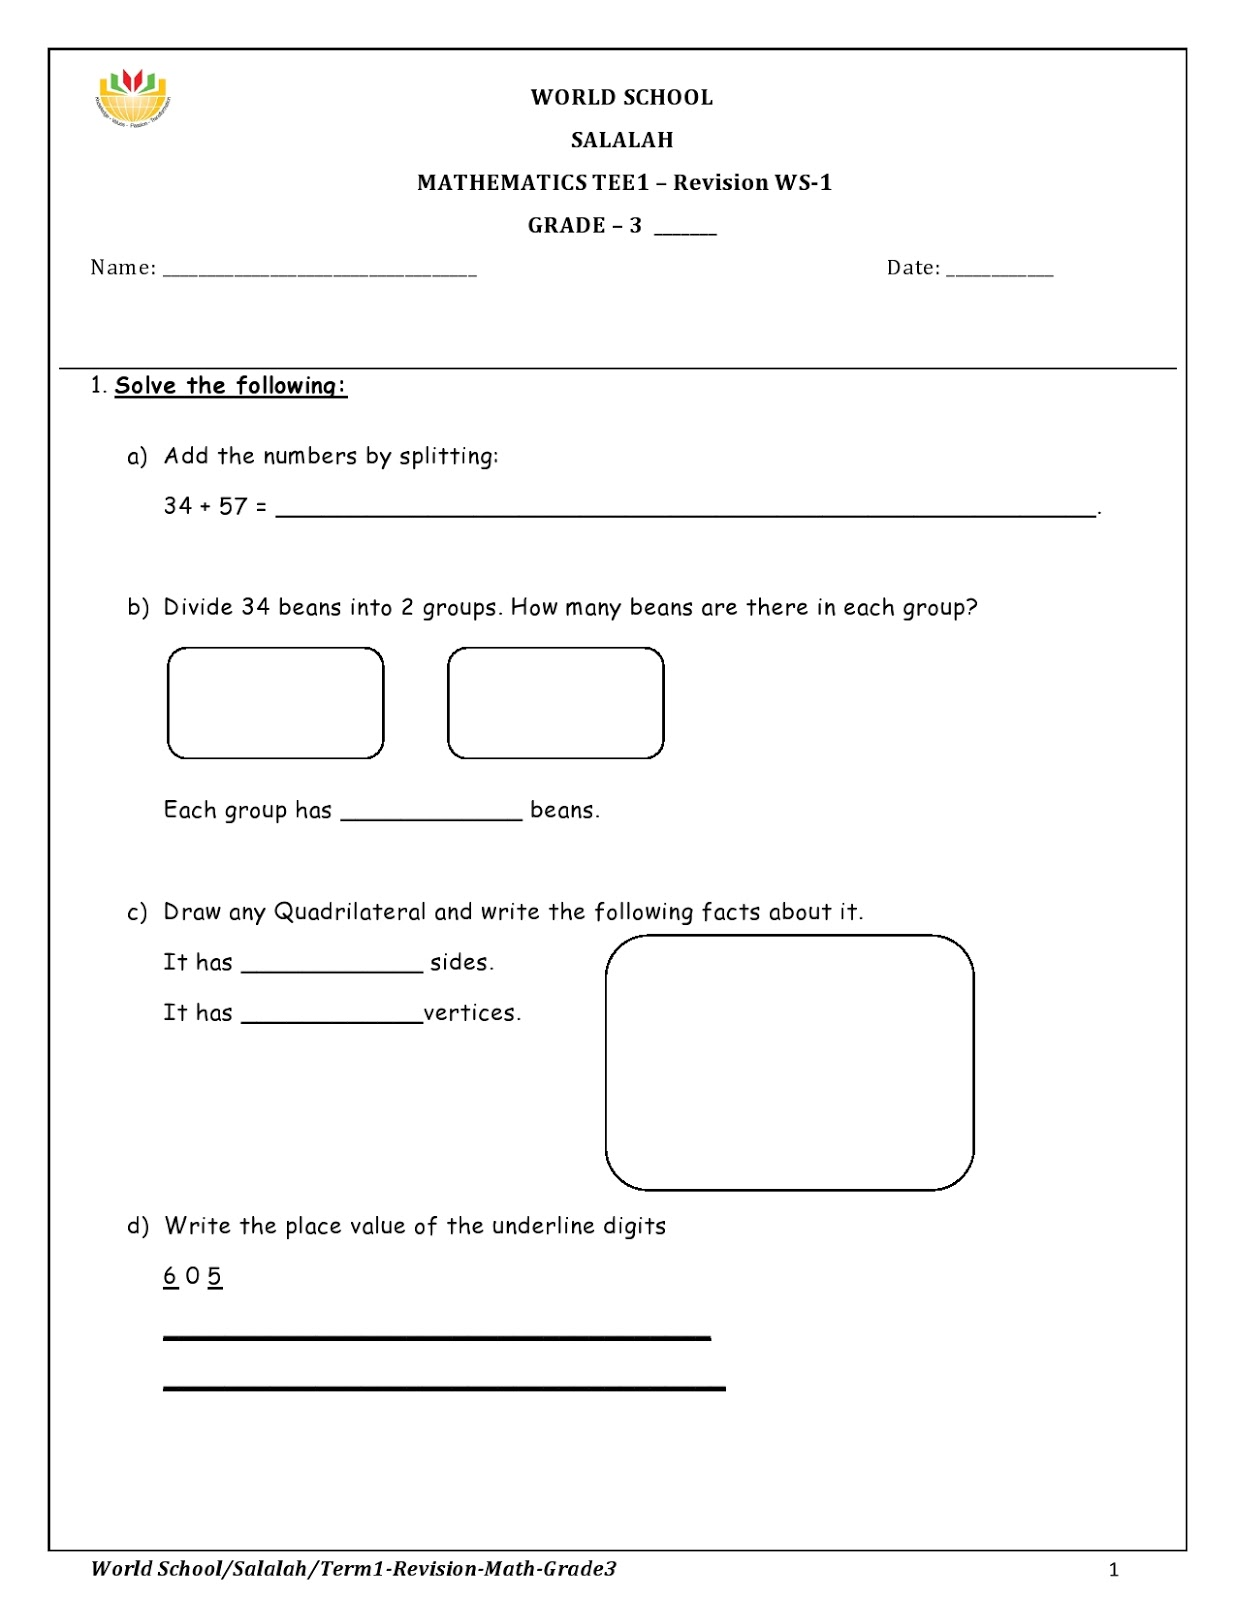 Birla World School Oman Homework For Grade 3 As On 25 12